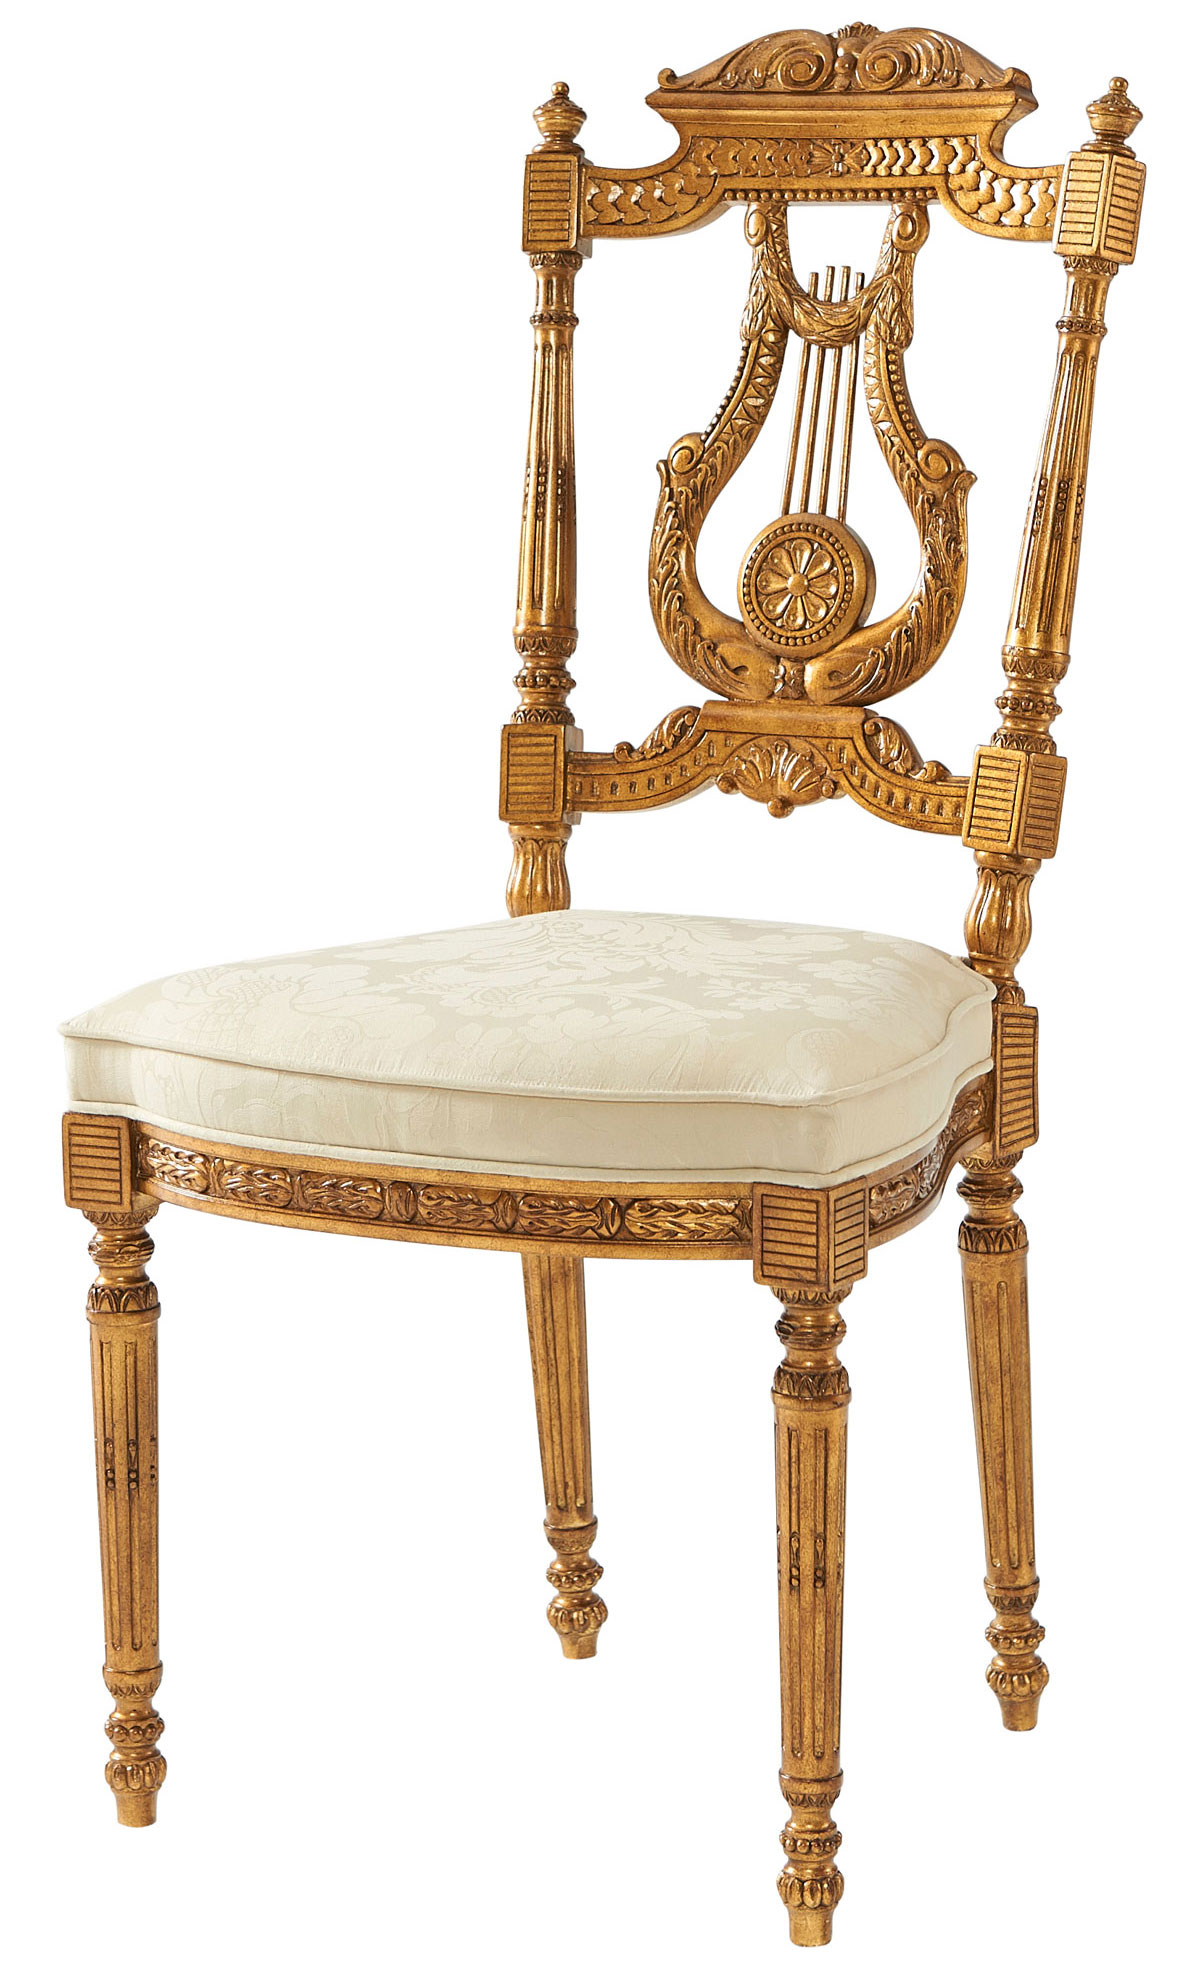 Sandalye 220r252nler Dream Home Fine Furniture : the boudoir chair from www.dreamhome.com.tr size 1200 x 1975 jpeg 334kB